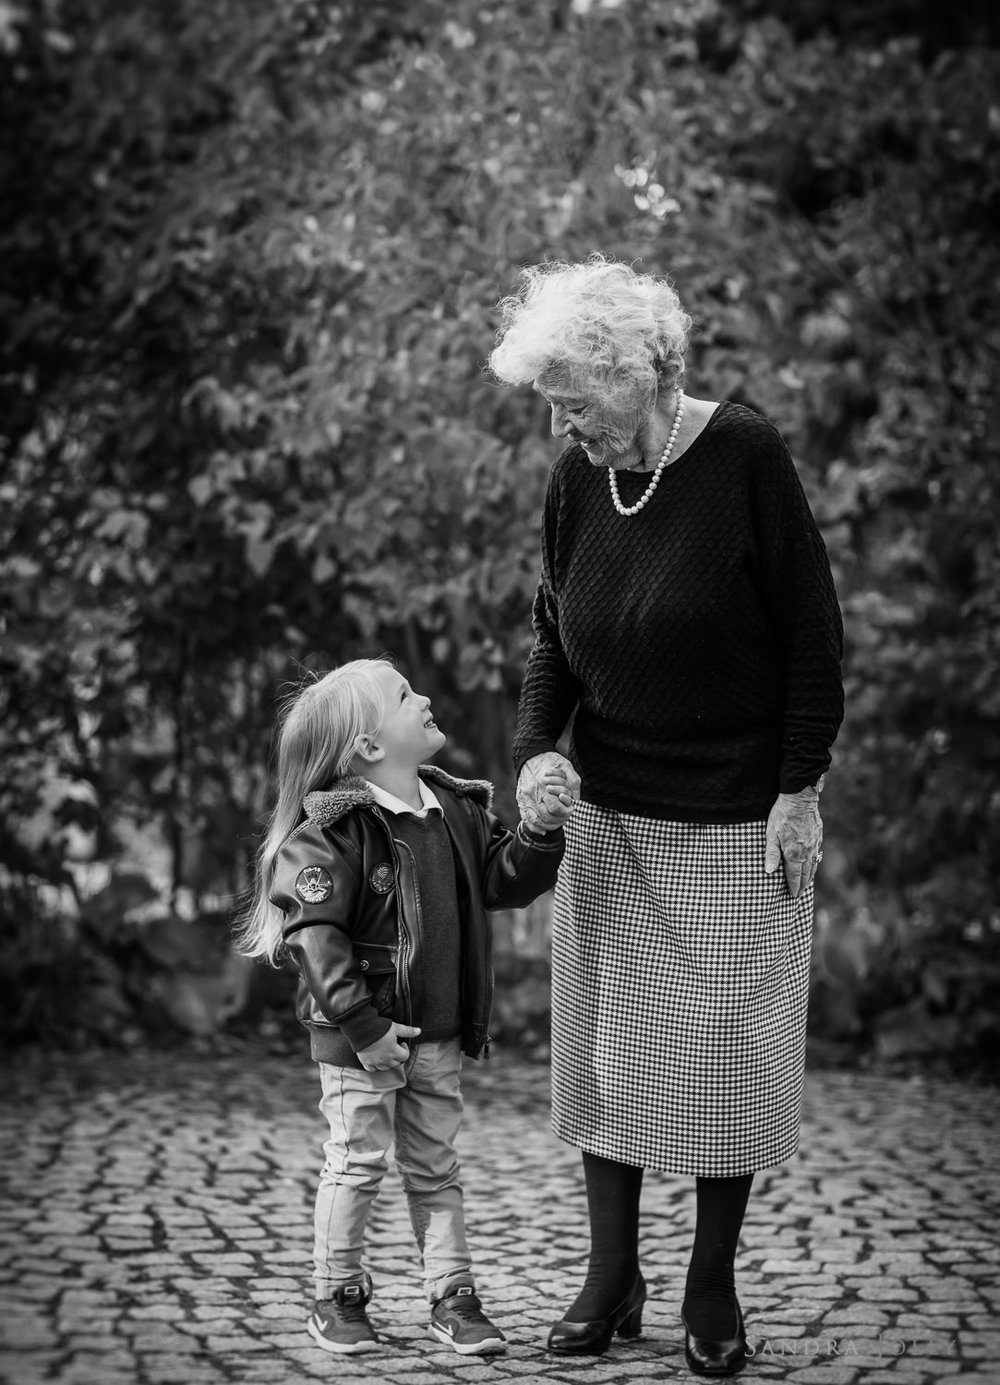 grandson-and-grandmother-by-Stockholm-family-photographer-Sandra-Jolly.jpg